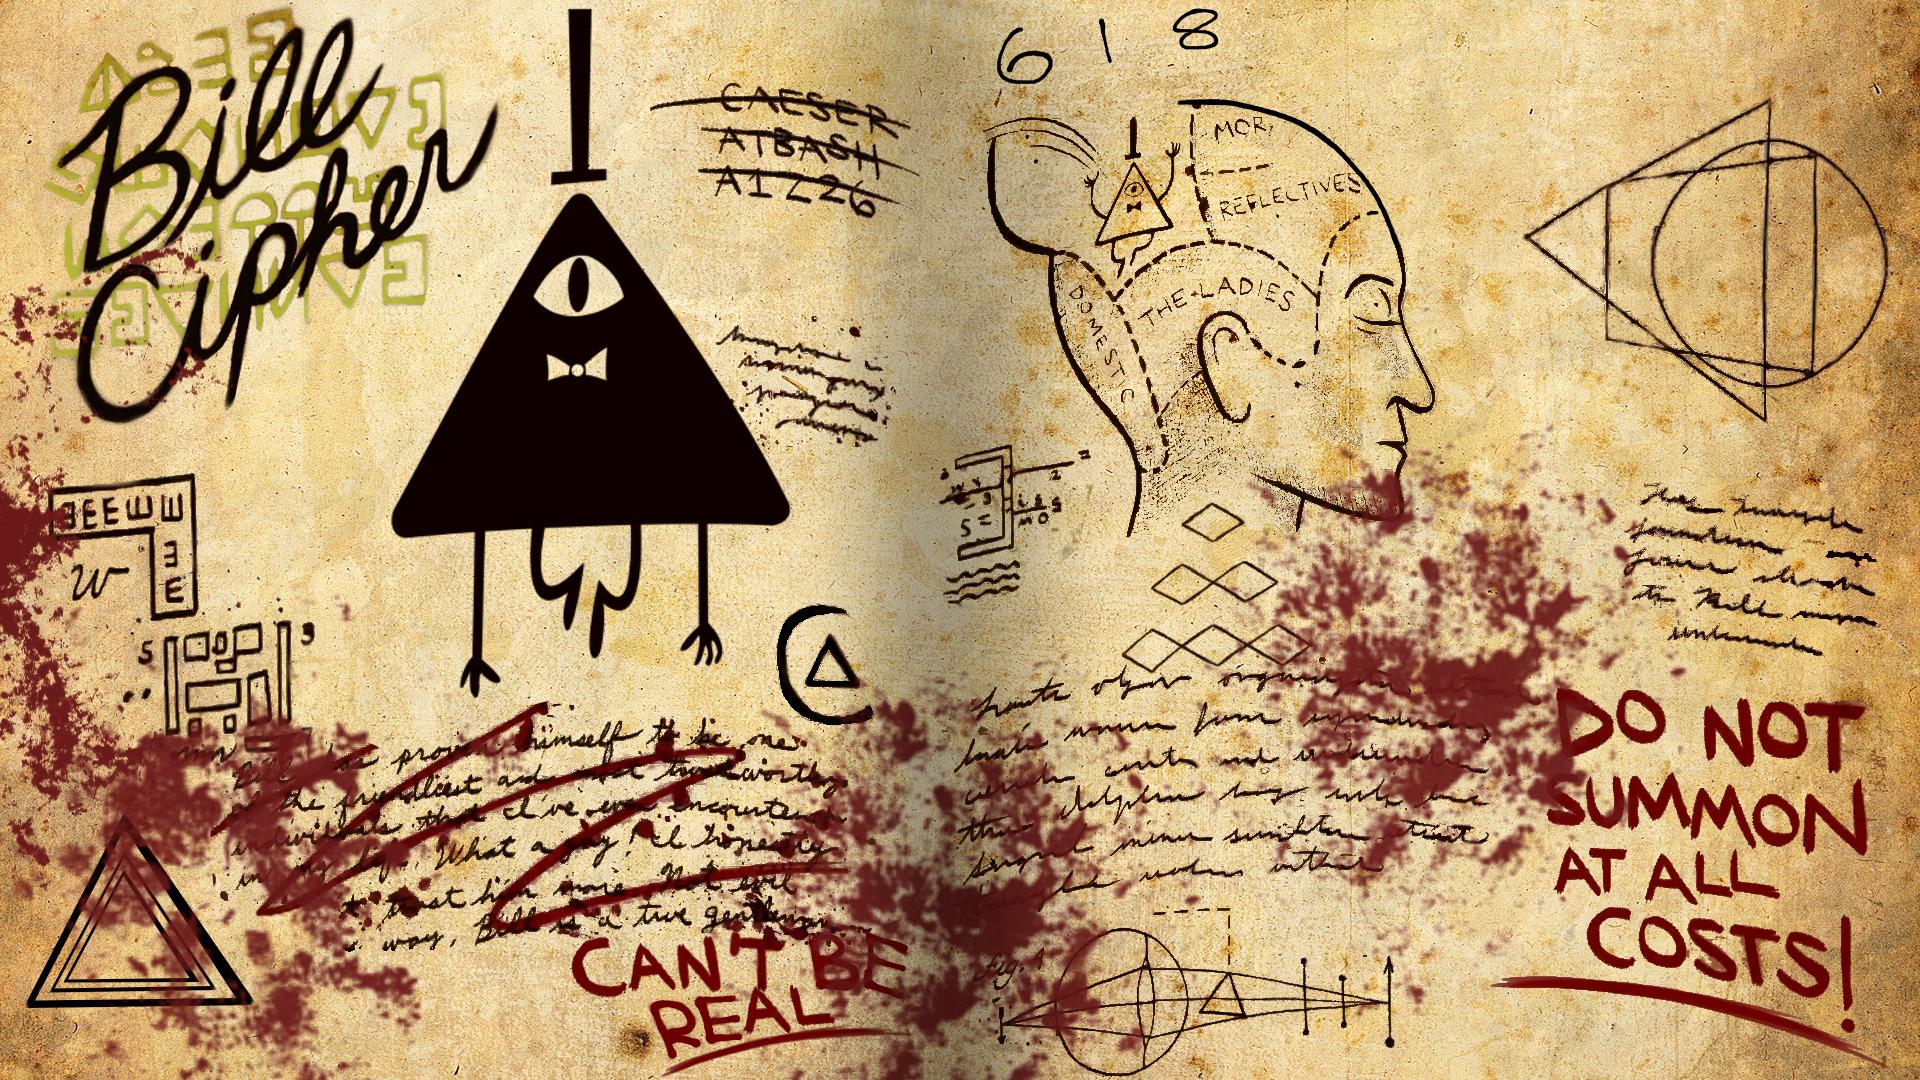 Disneys Gravity Falls Is Weird Americana Meets Lovecraft For Kids